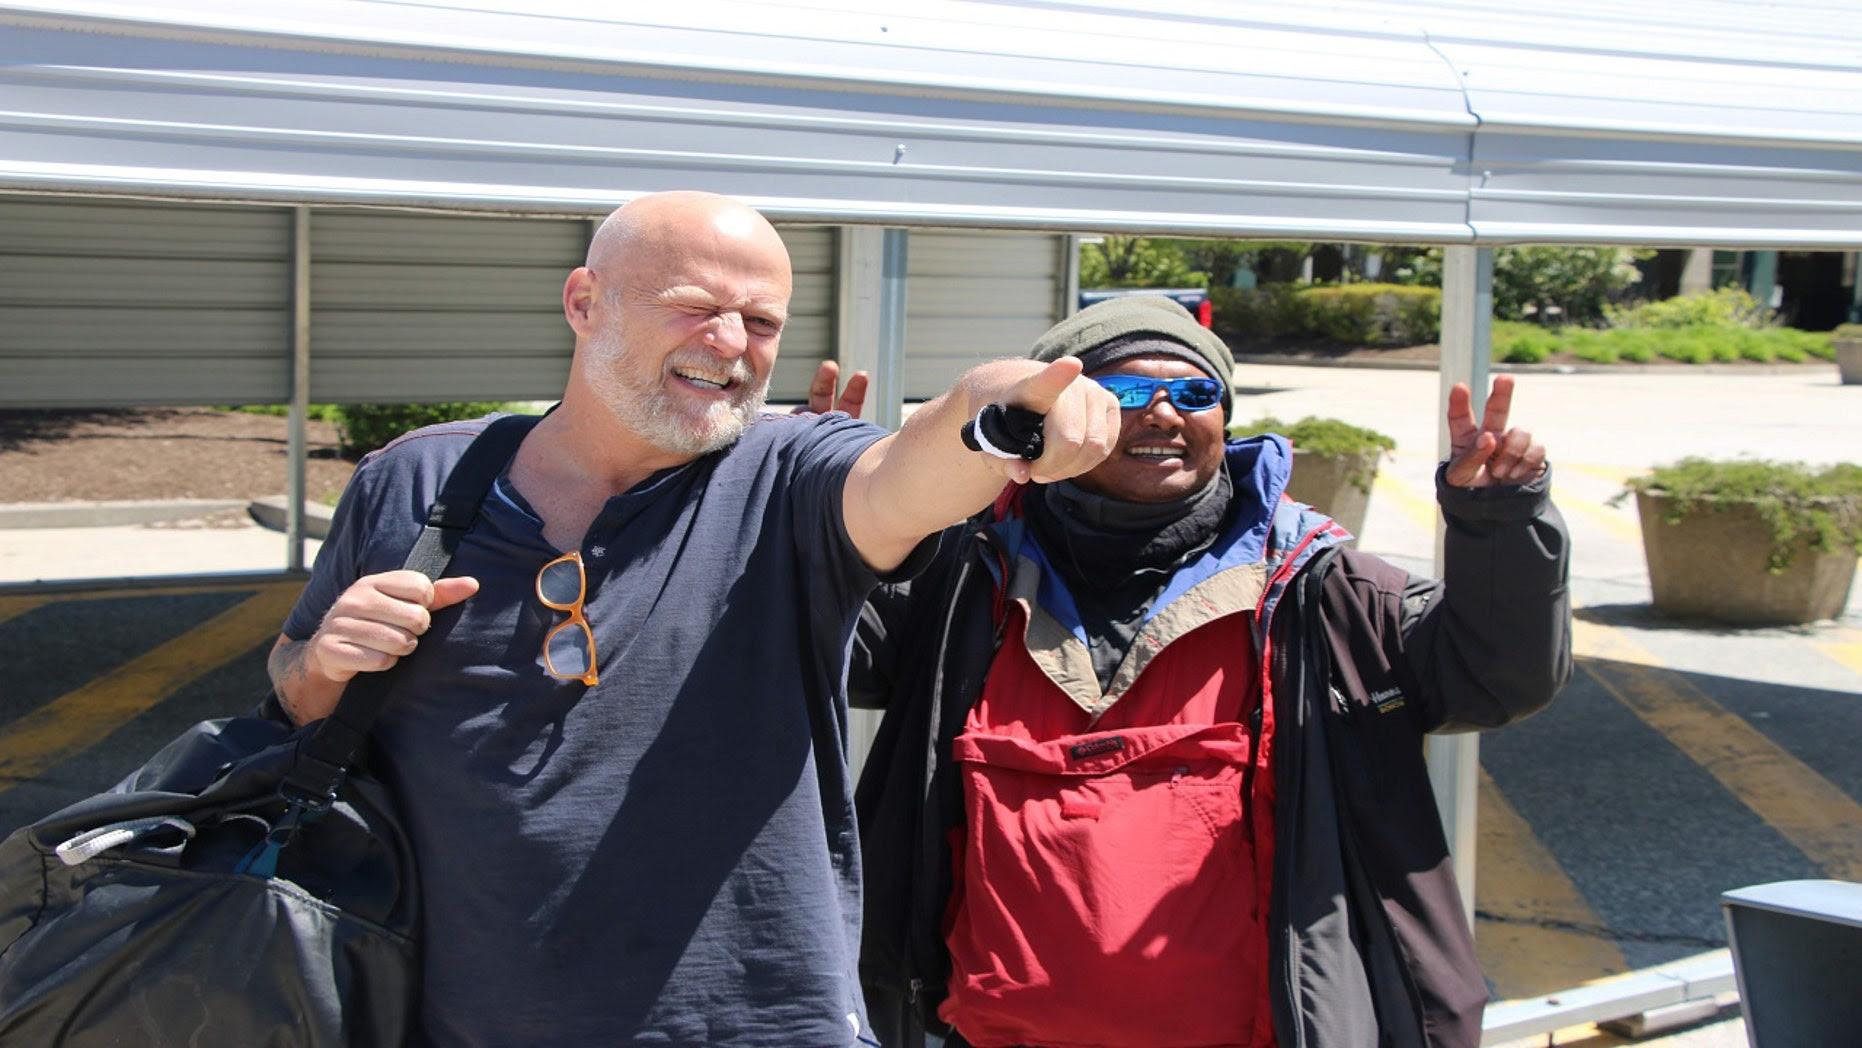 Scott Kuczmarski and Robert Pineda in Palo Alto